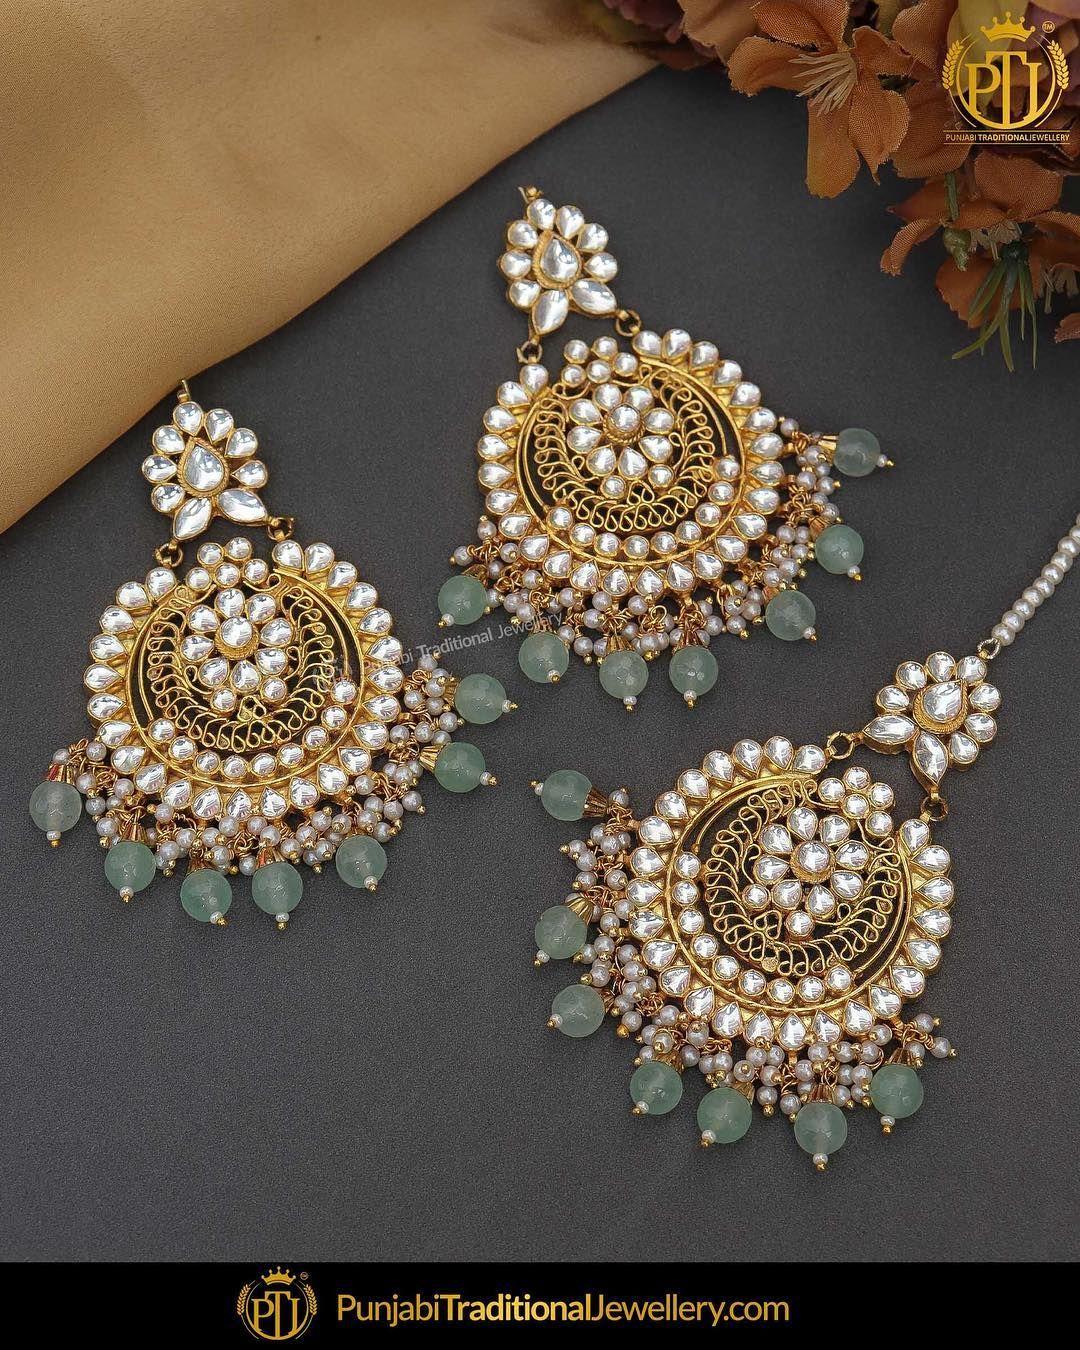 Bridal Jewellery Wedding Necklace set with earrings Punjabi Jewellery Indian Jewellery tika /& paasa Pakistani Jewellery